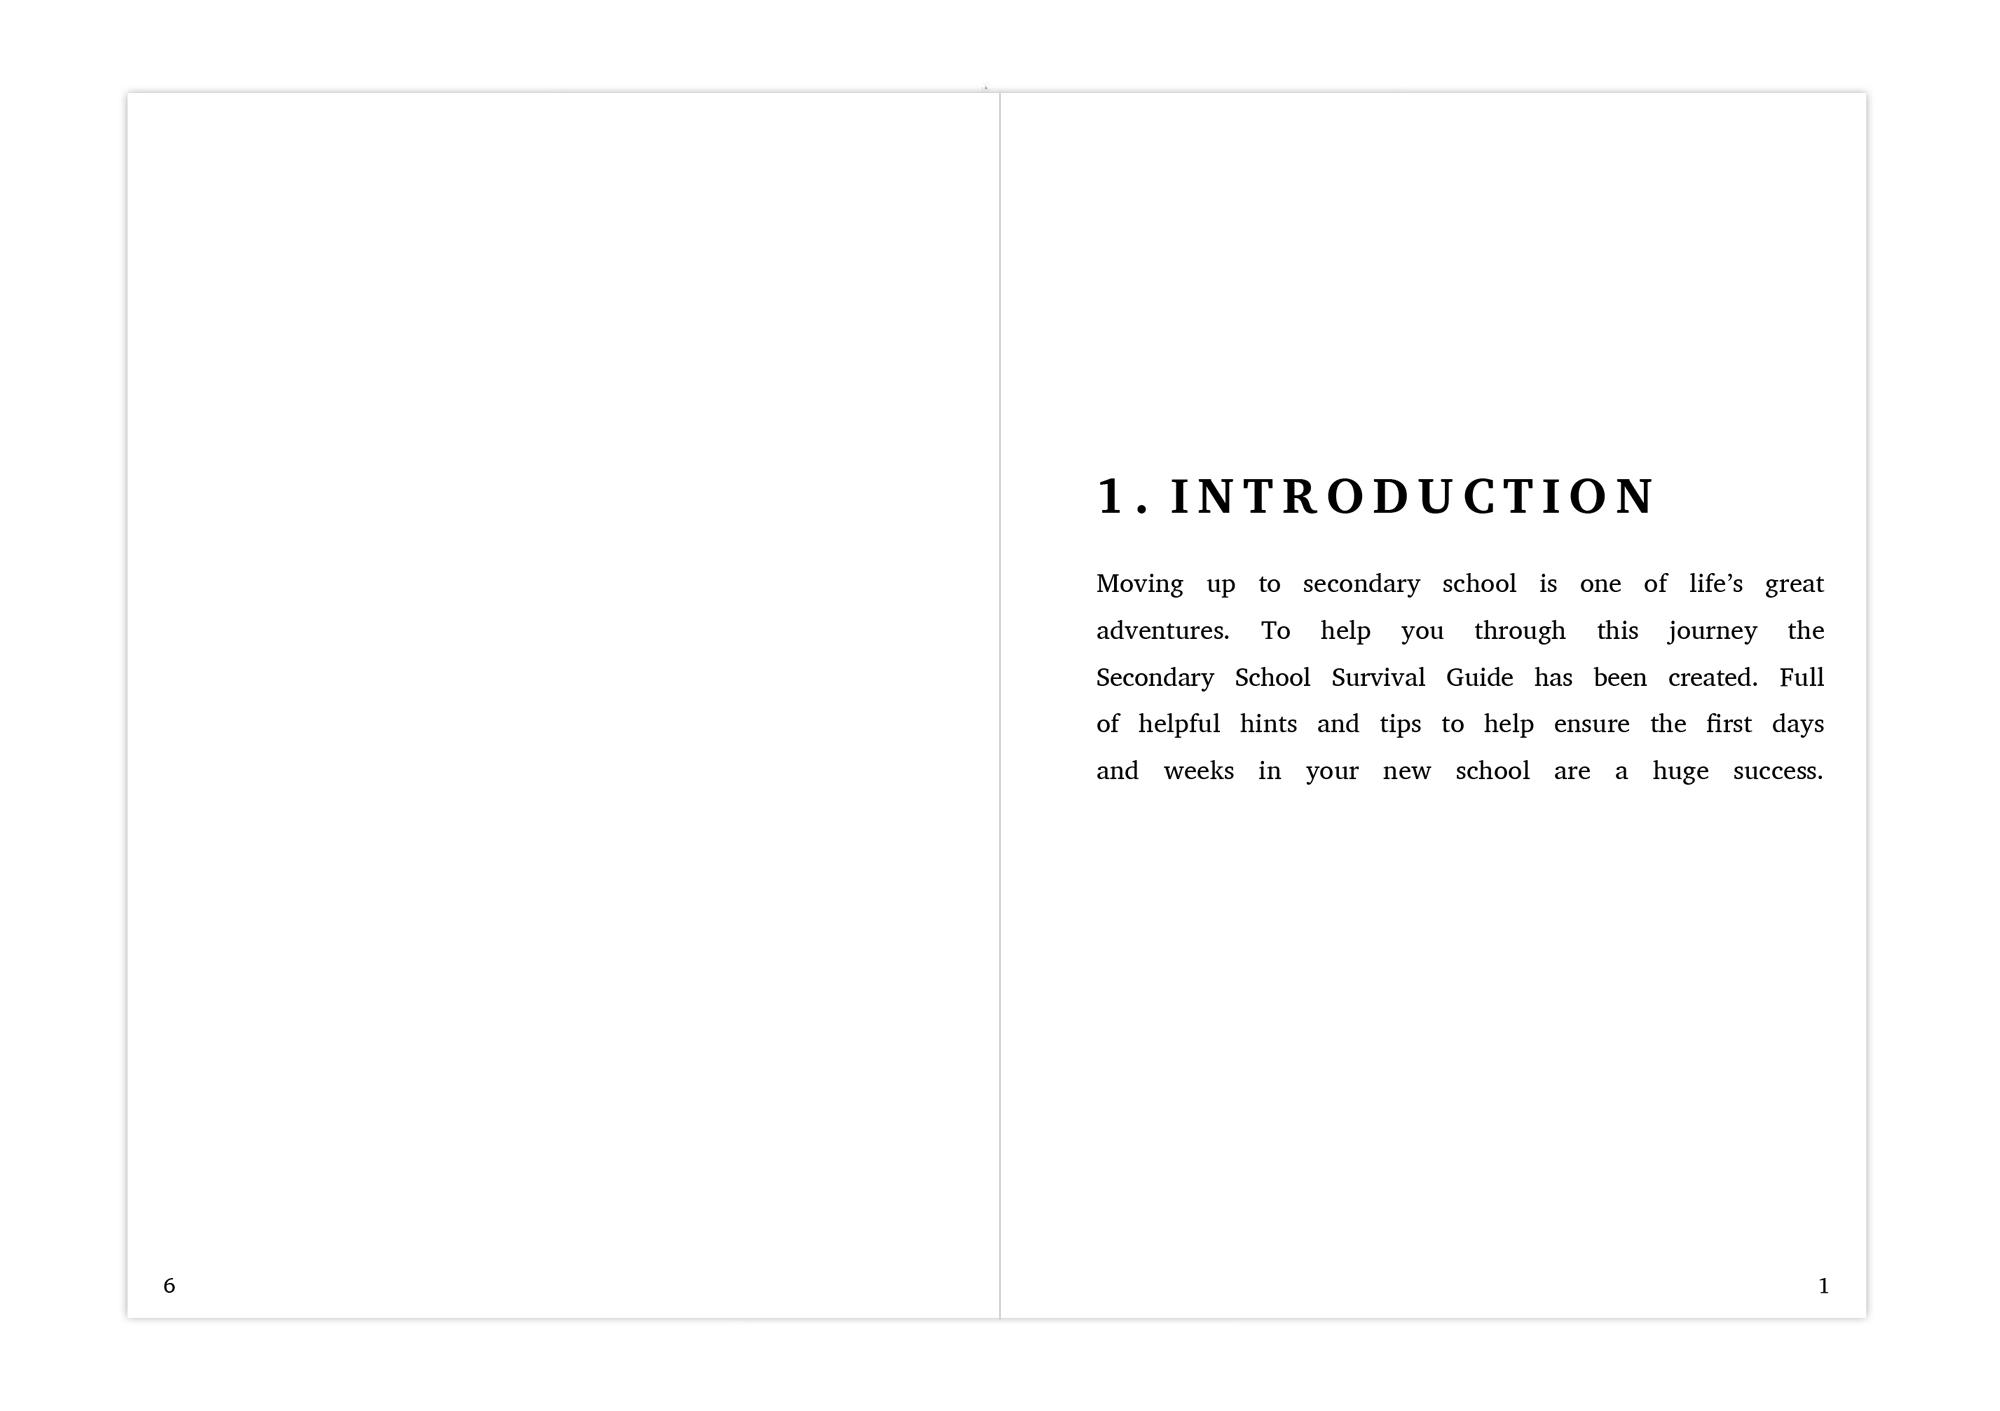 SG-Spead-introductionpage.jpg